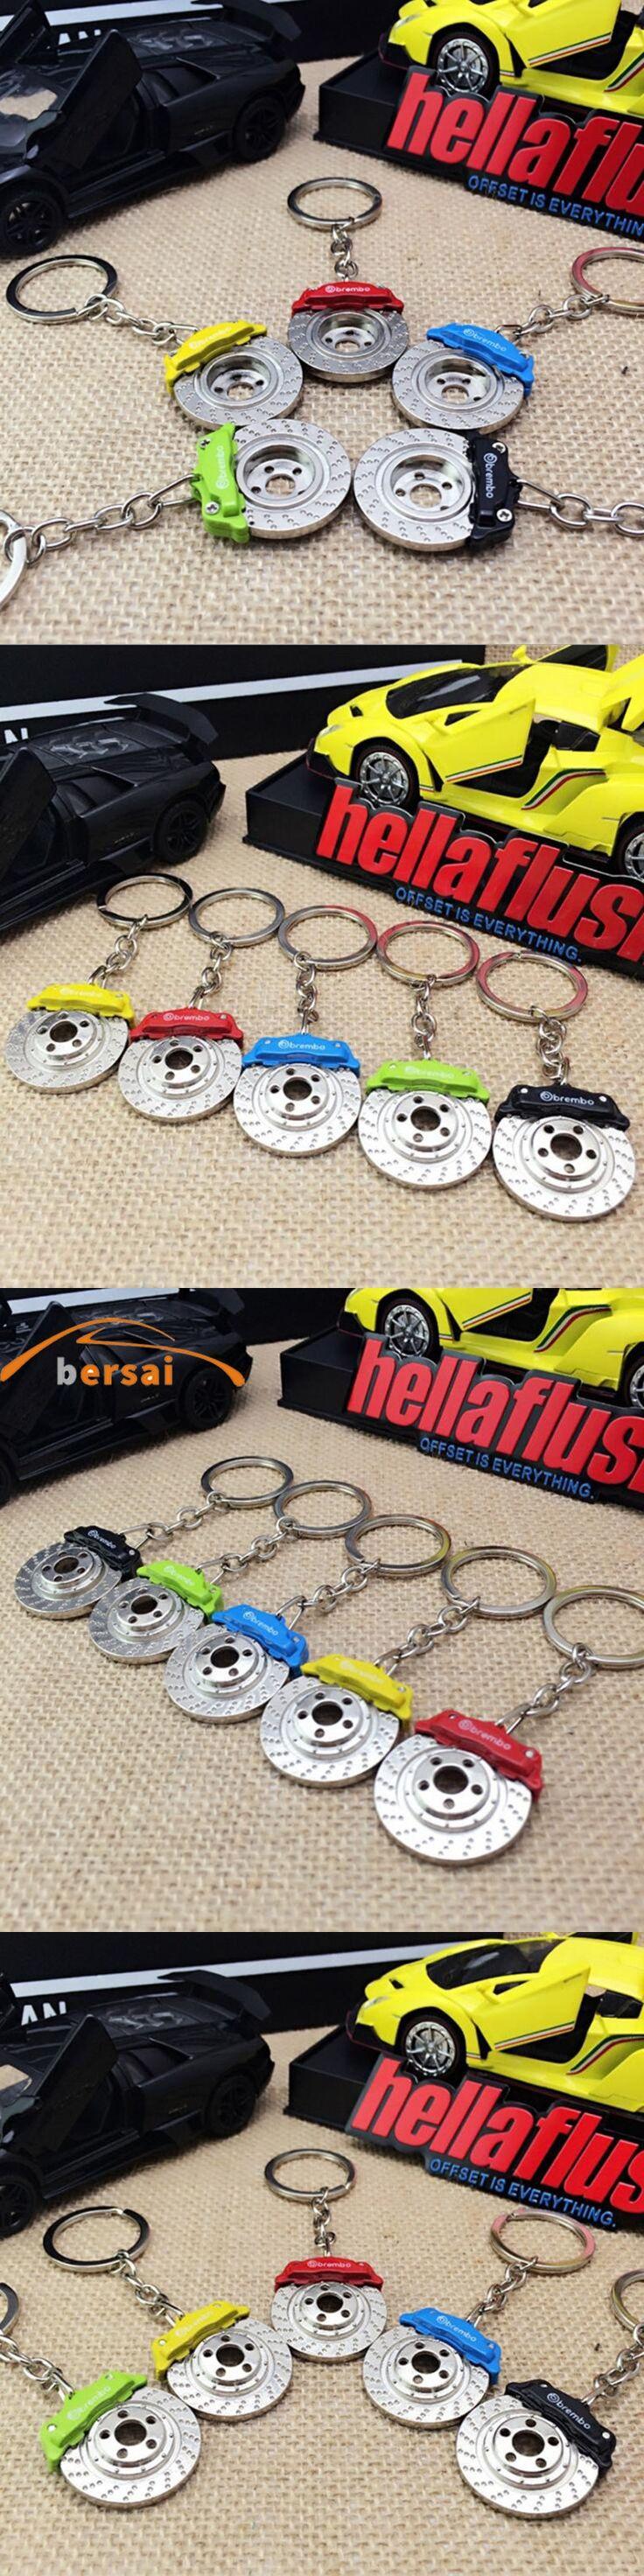 BERSAI 1 piece Alloy Car brake pads shape key ring For TOYOTA Reiz Mazda ATENZA bmW 357 Mercedes-Benz Car styling accessories